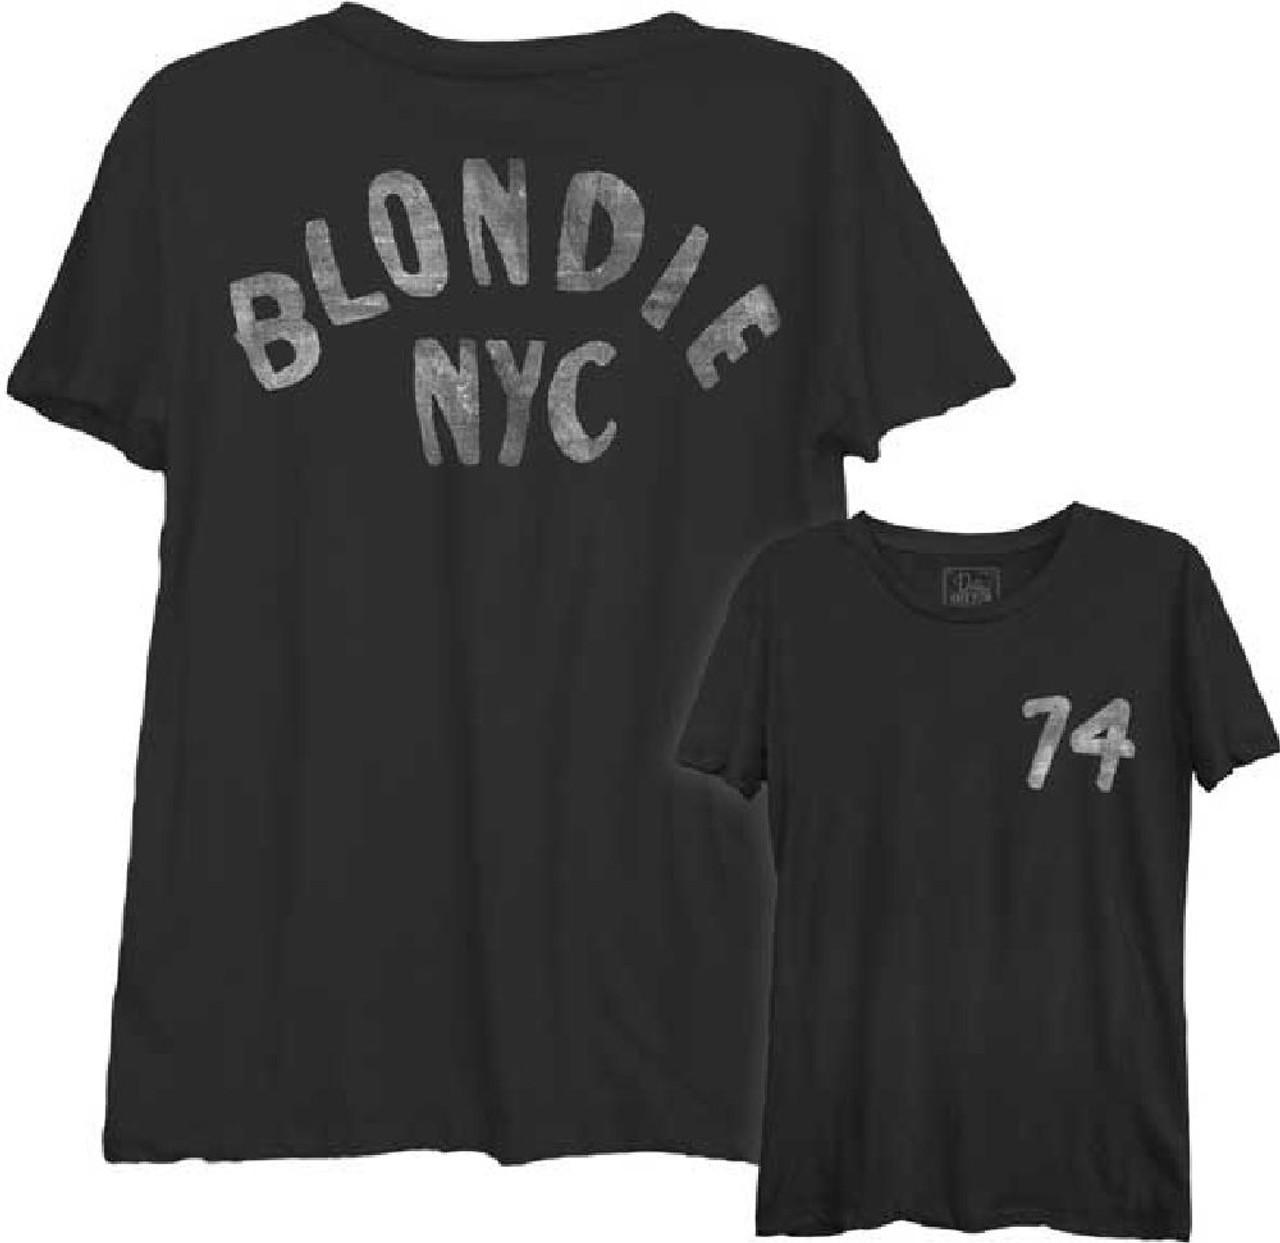 0ee96e22f812 Blondie T-shirt - NYC '74   Women's Black Shirt by Dirty Cotton ...